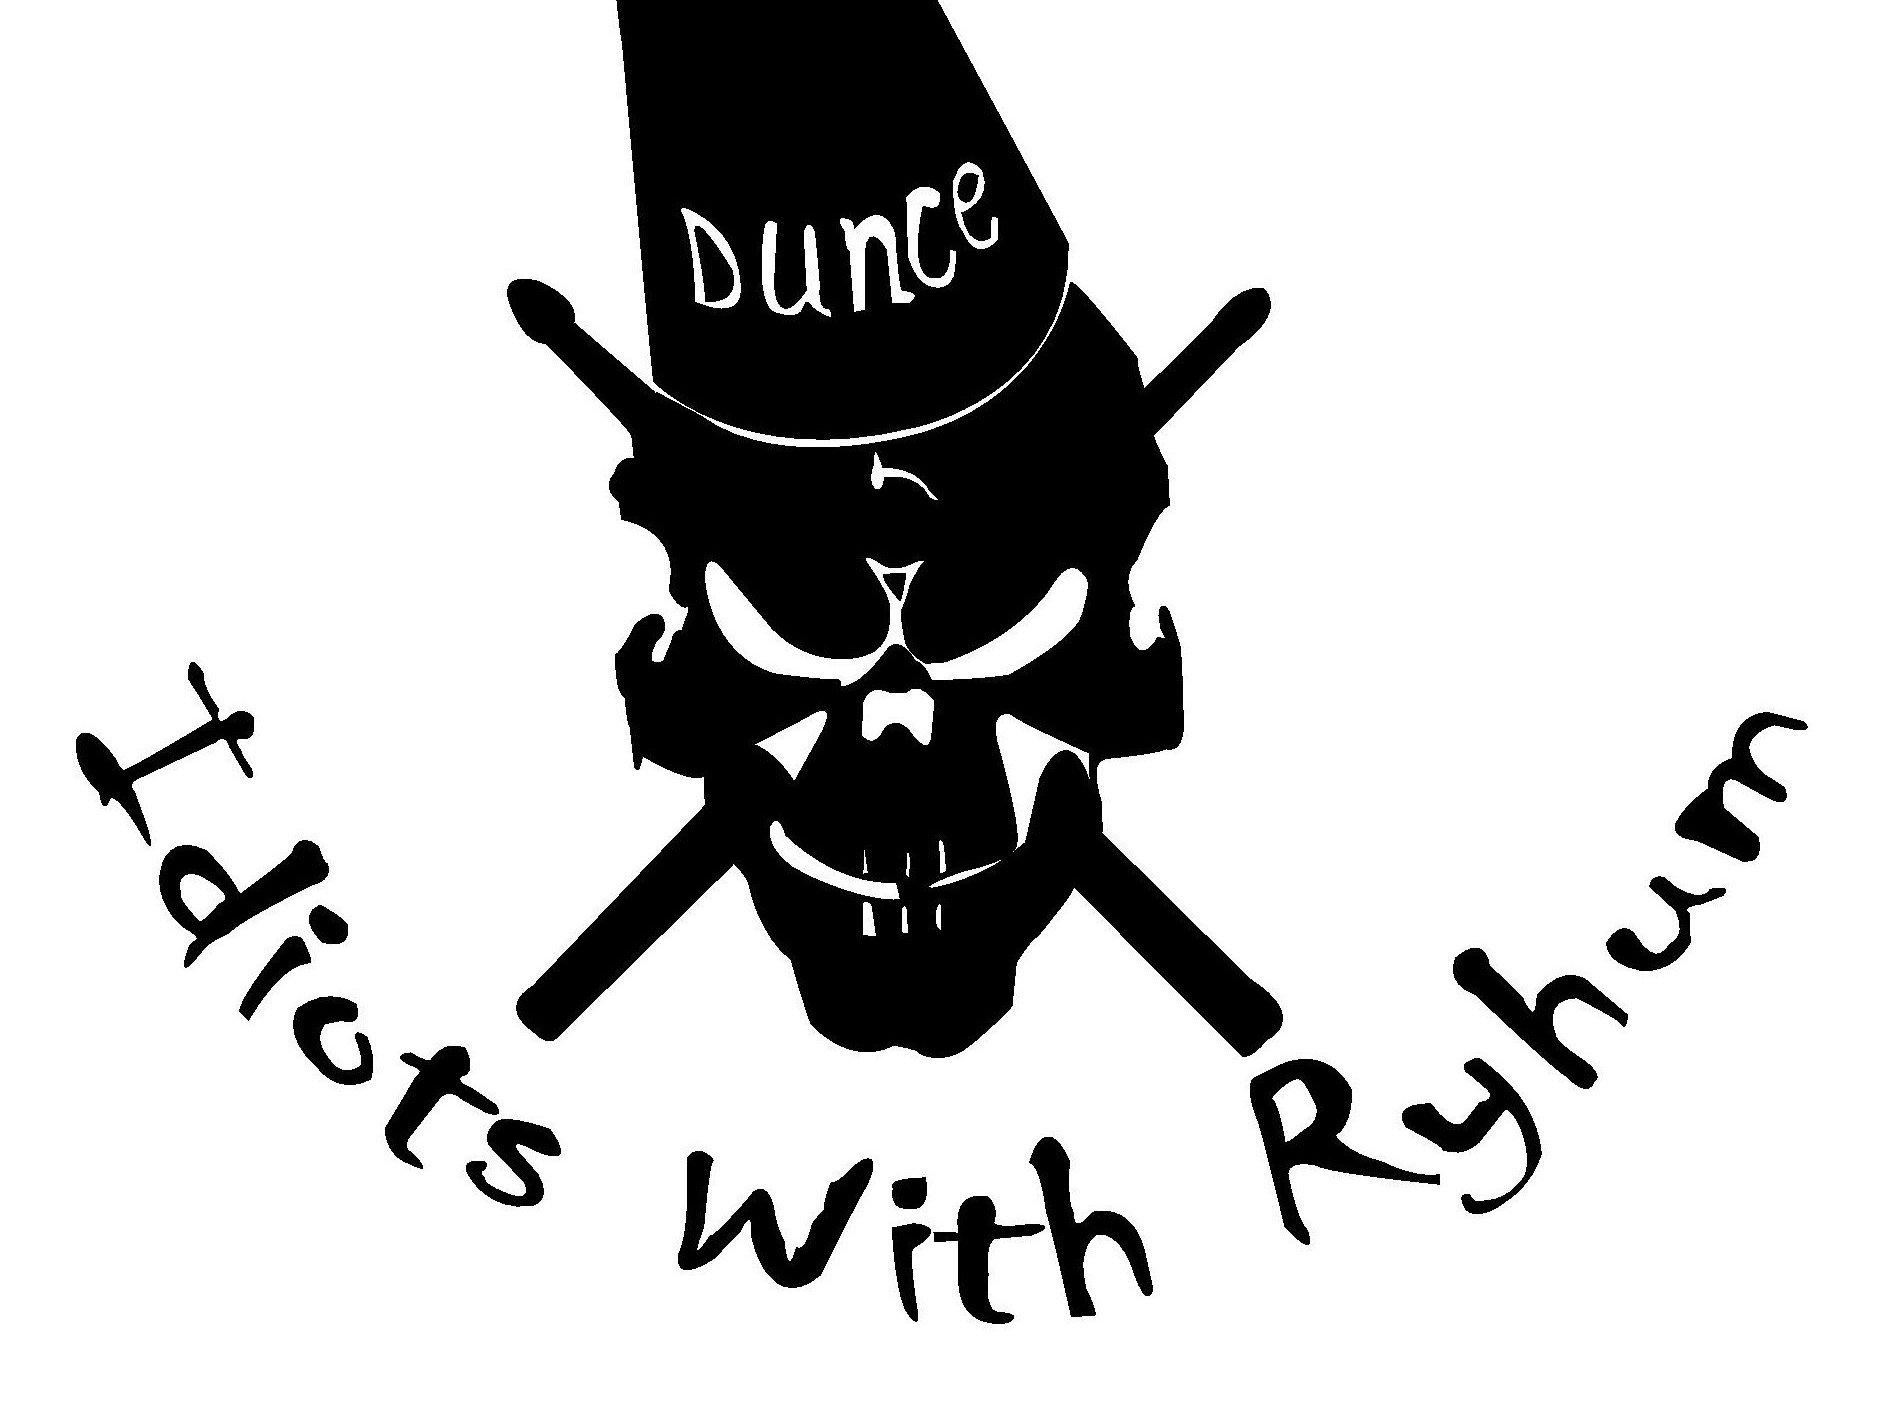 Image for Idiots with Ryhum